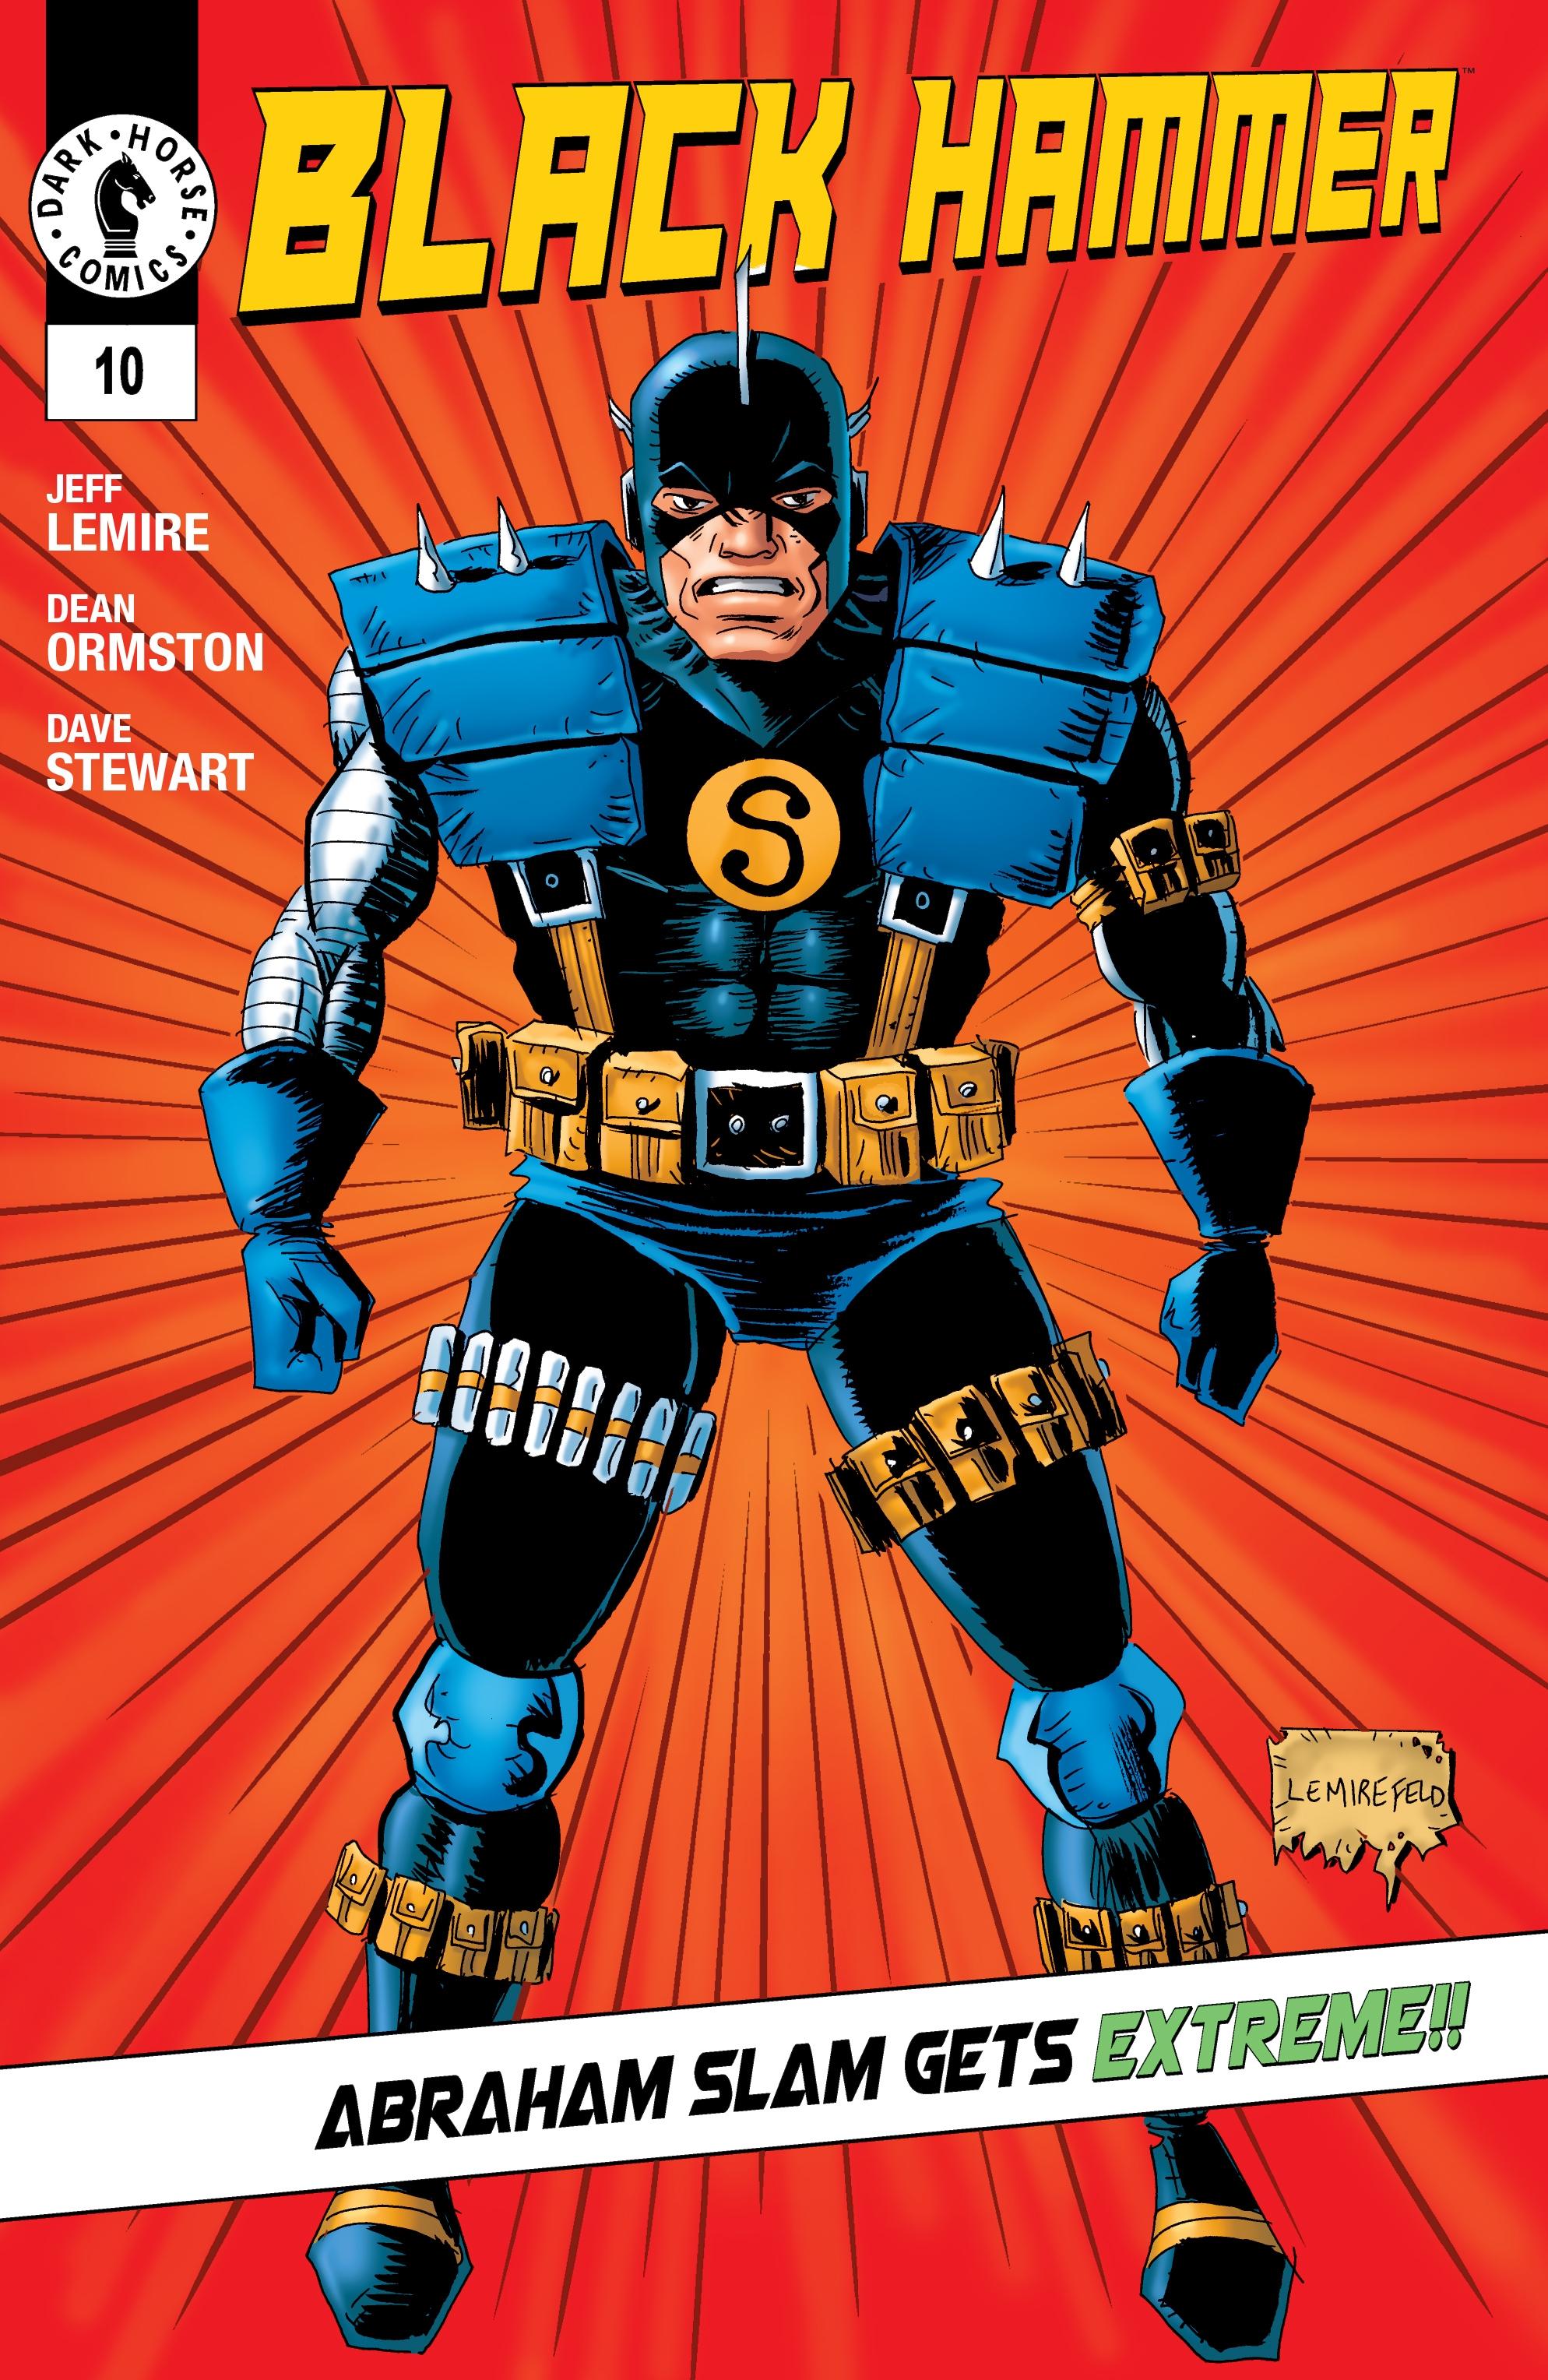 Read online Black Hammer comic -  Issue #10 - 2